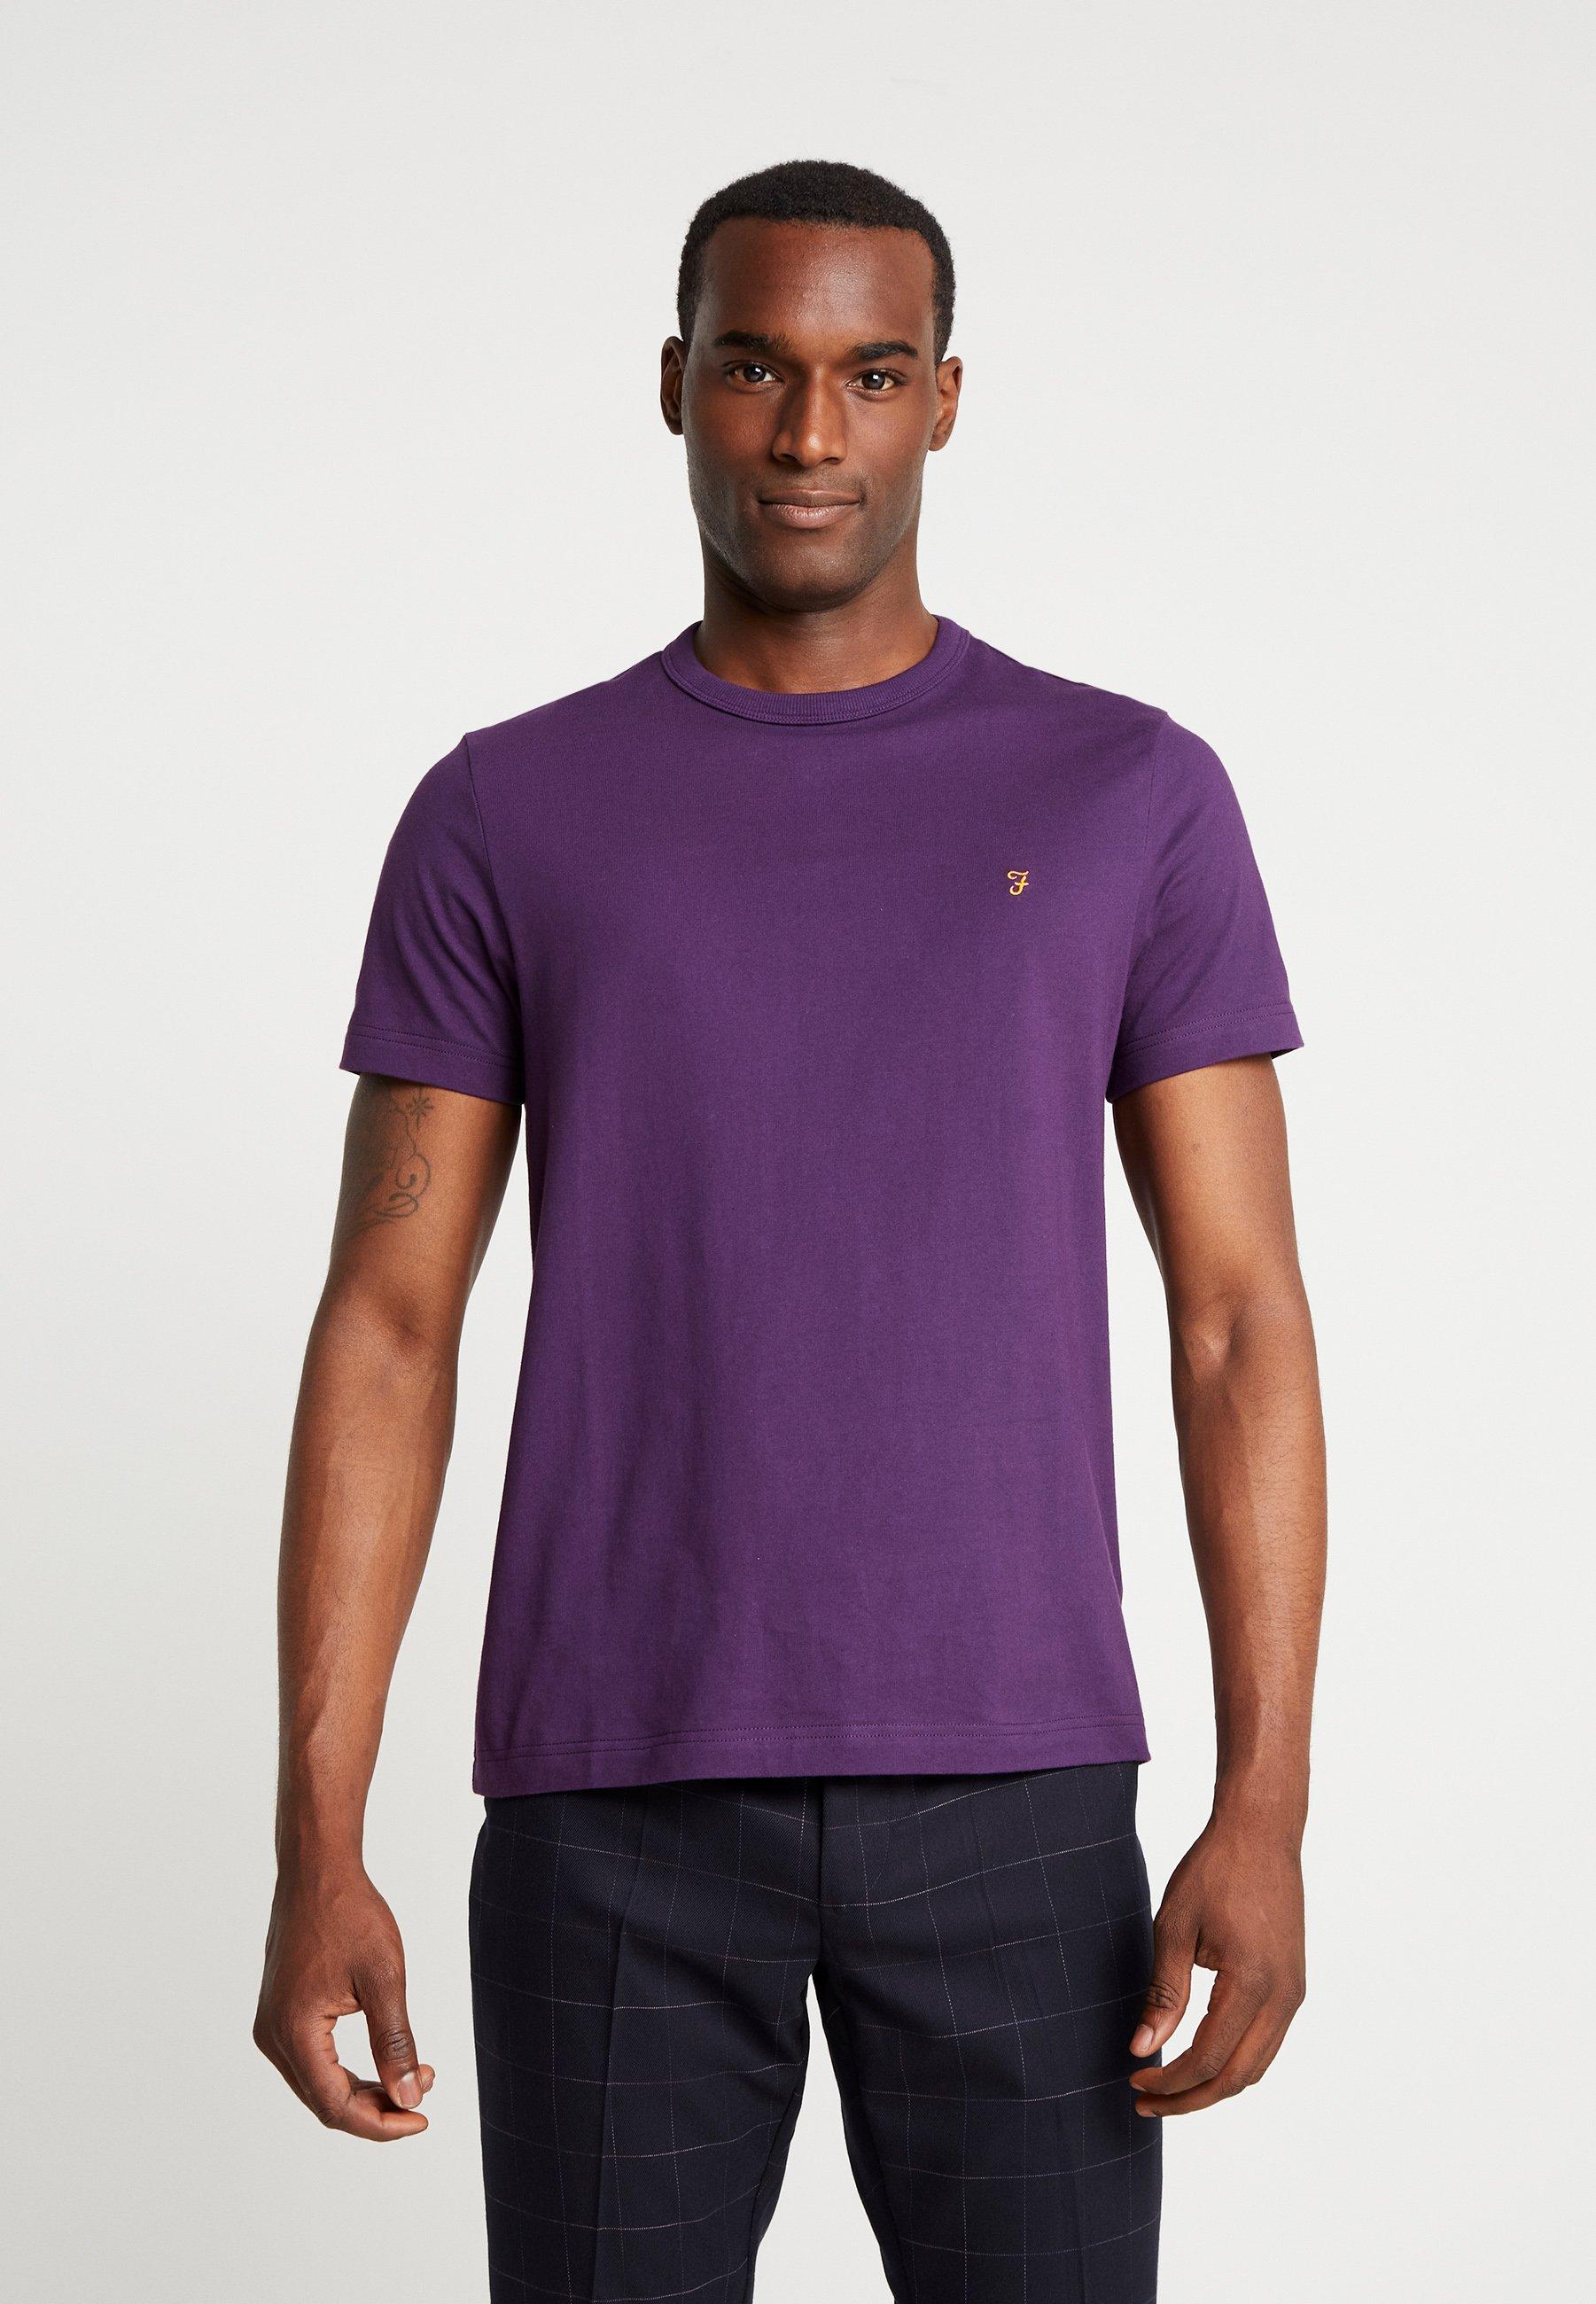 shirt Farah Basique Purple DennisT Bright m0nvN8w